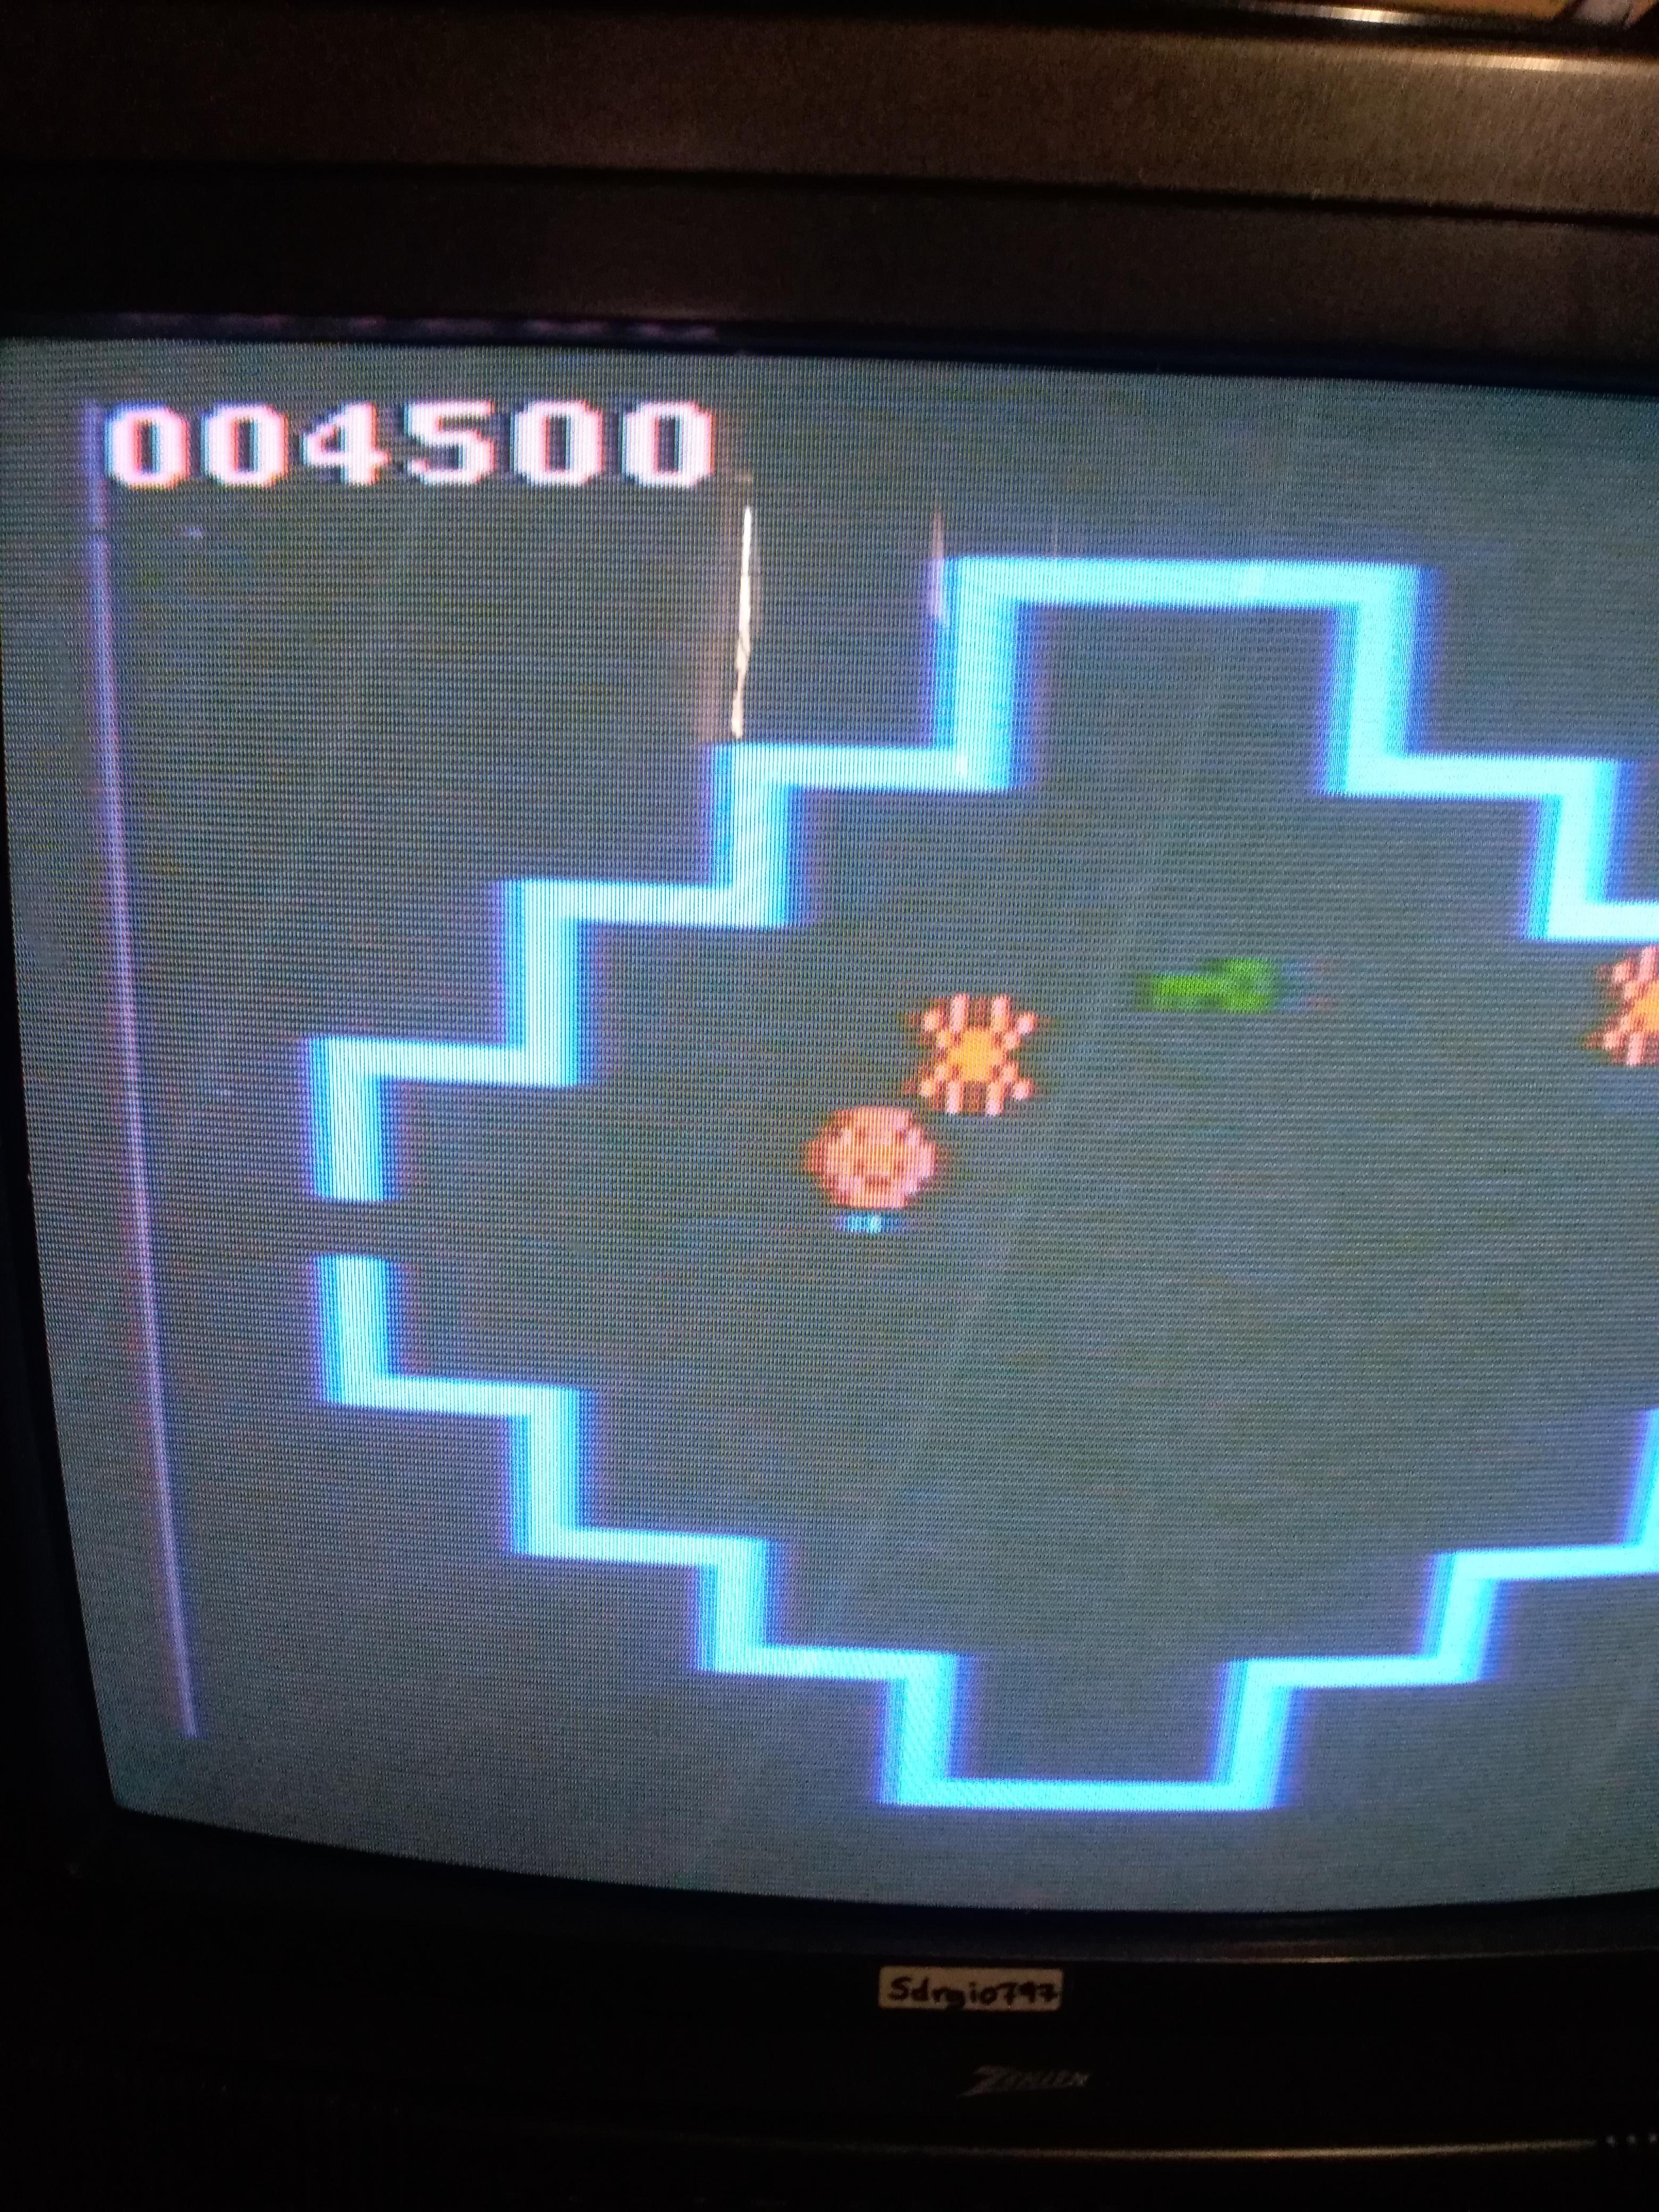 Sdrgio797: Venture (Atari 2600 Expert/A) 4,500 points on 2020-06-26 21:26:25